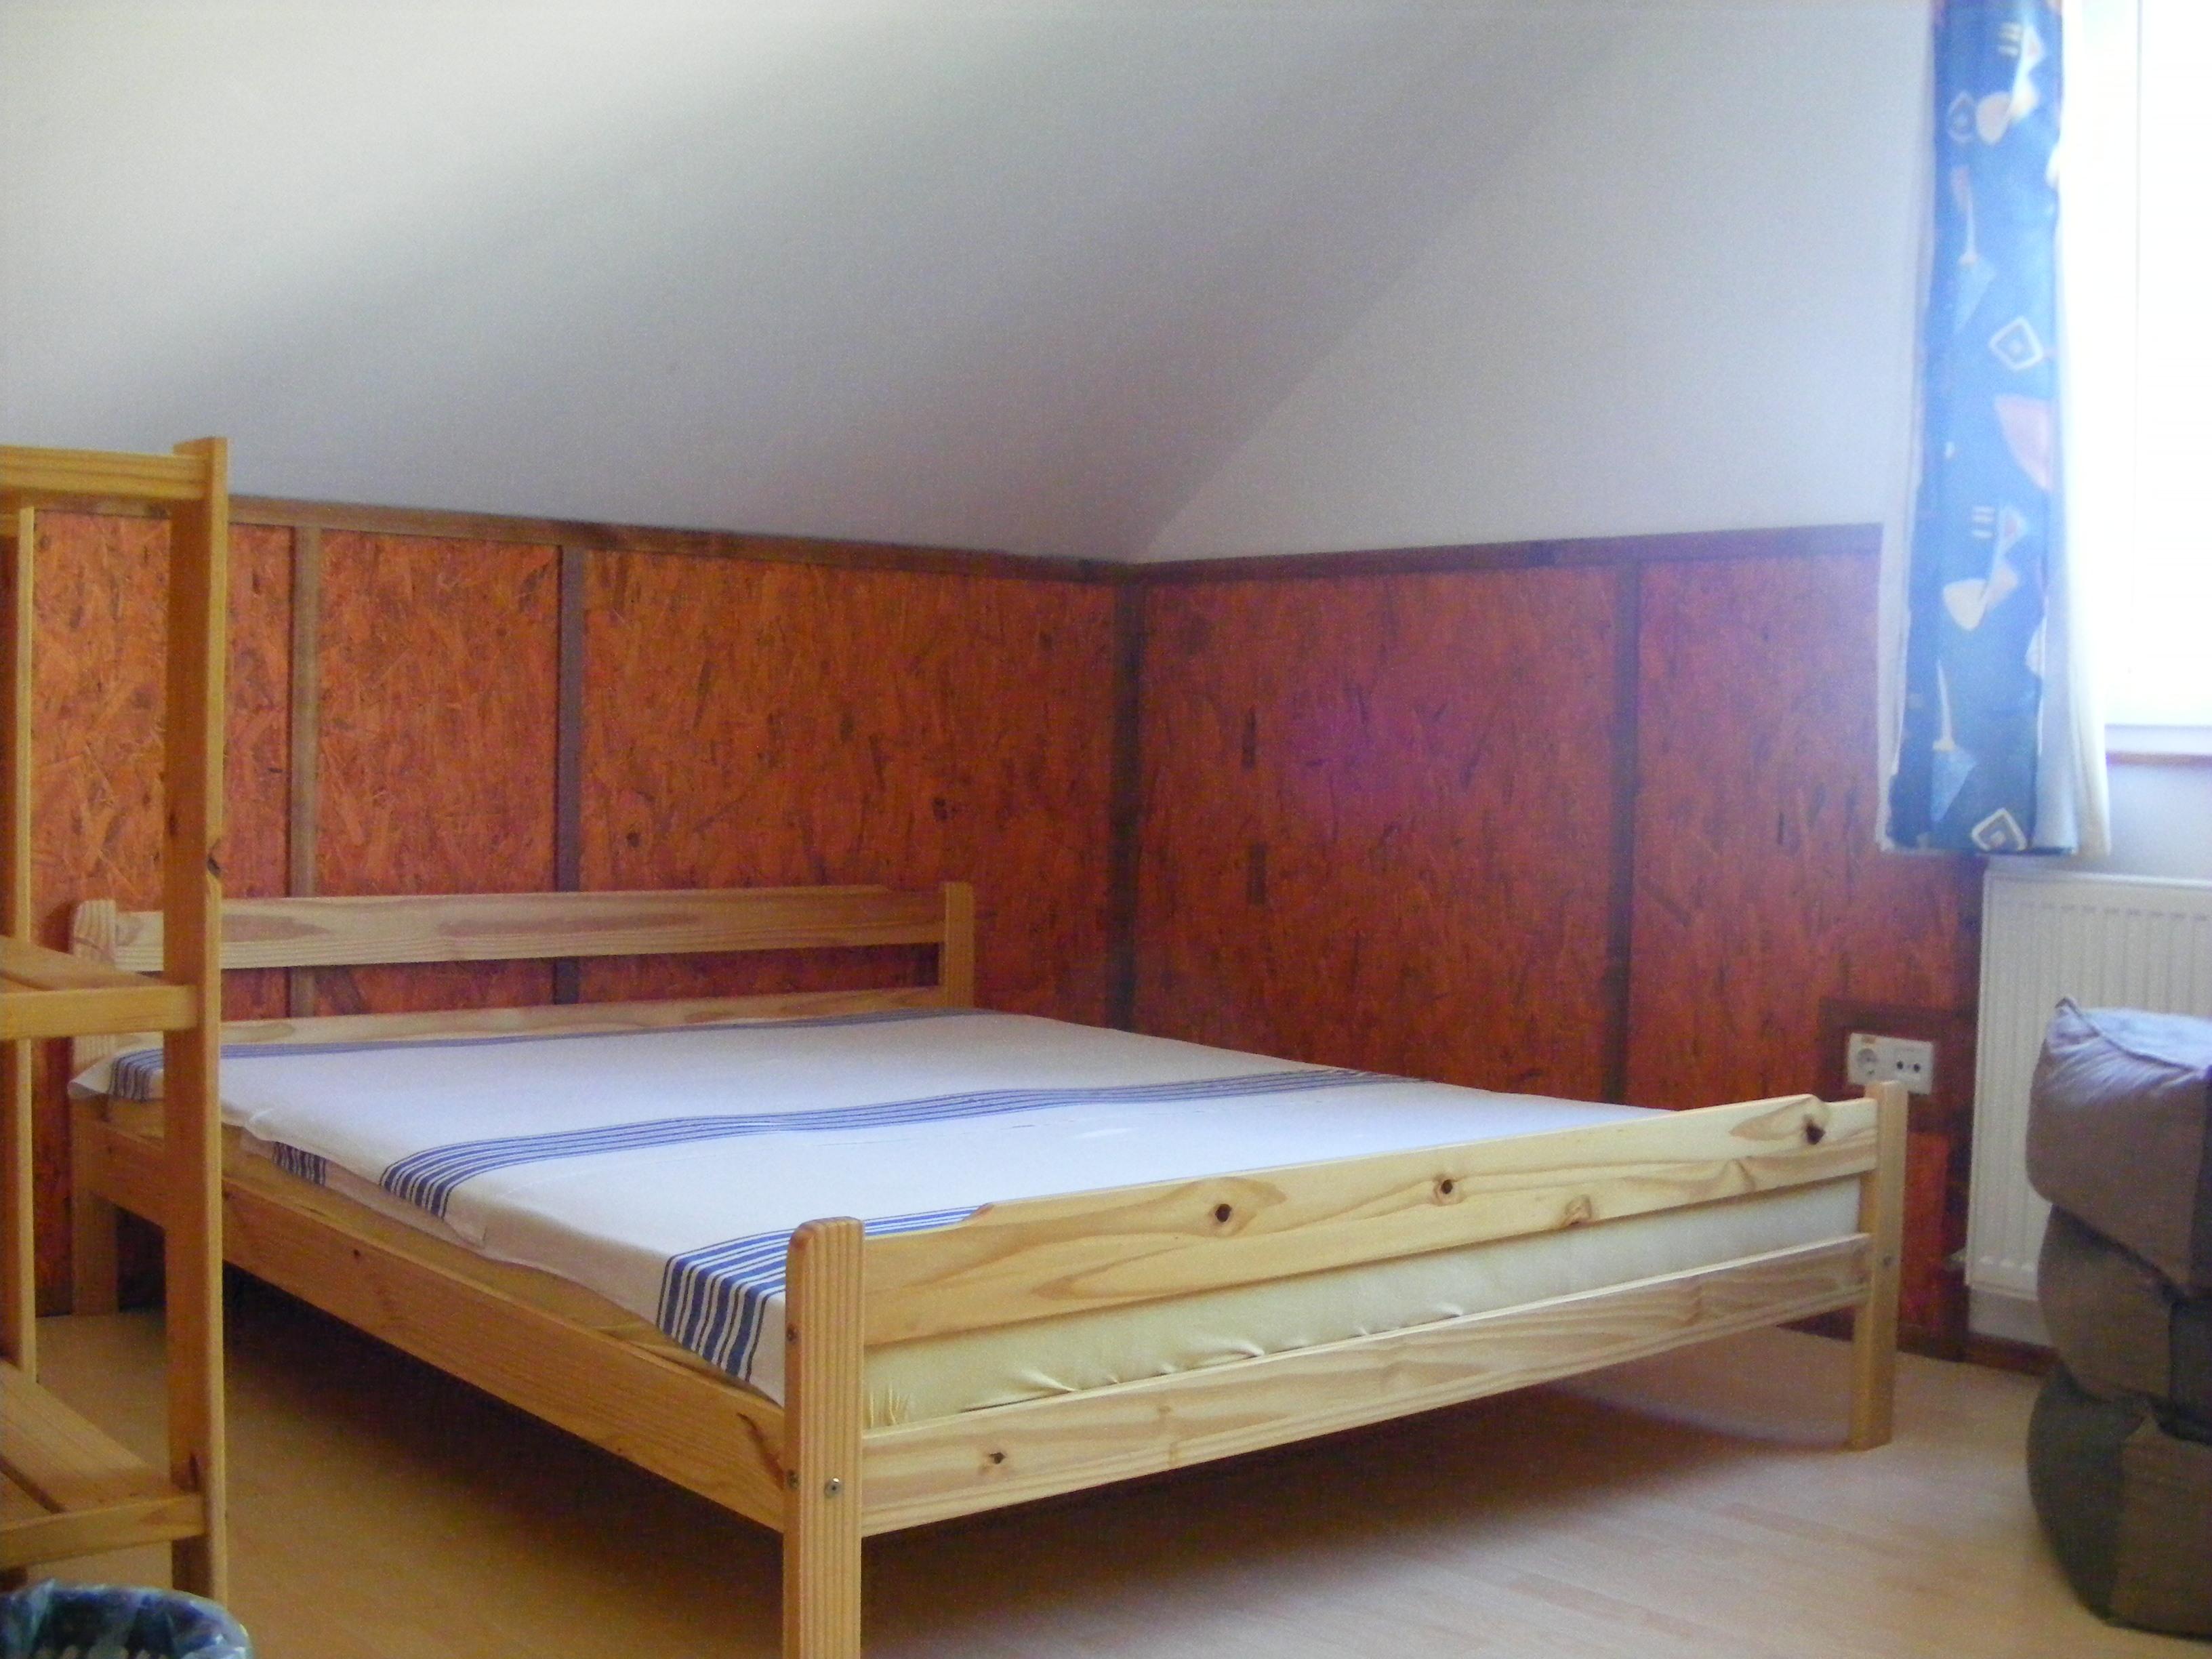 dorm_room2